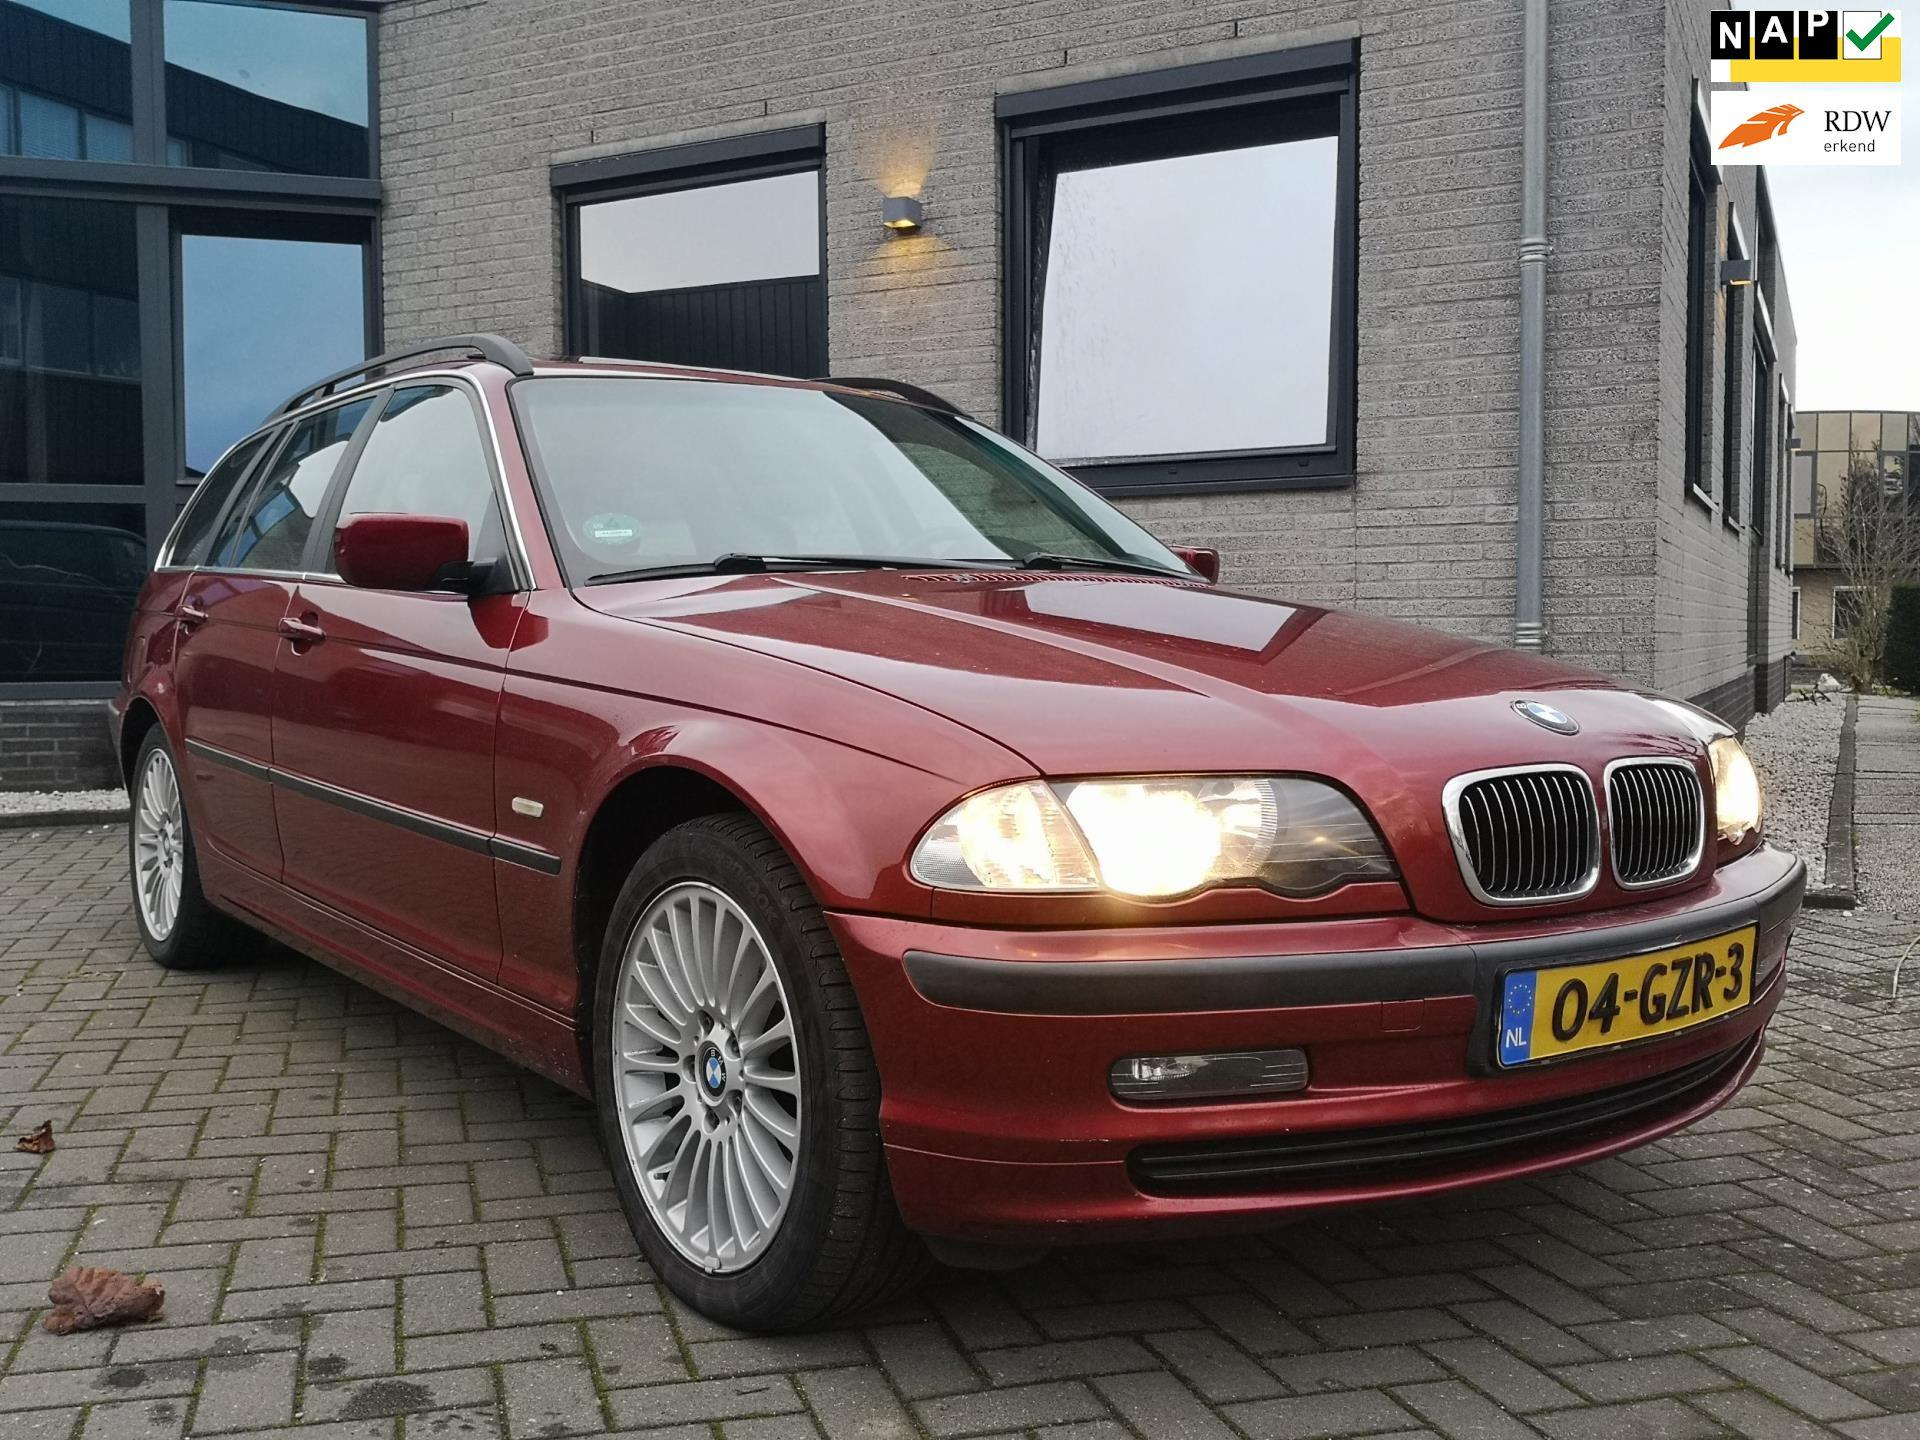 BMW 3-serie Touring occasion - Polarcars B.V